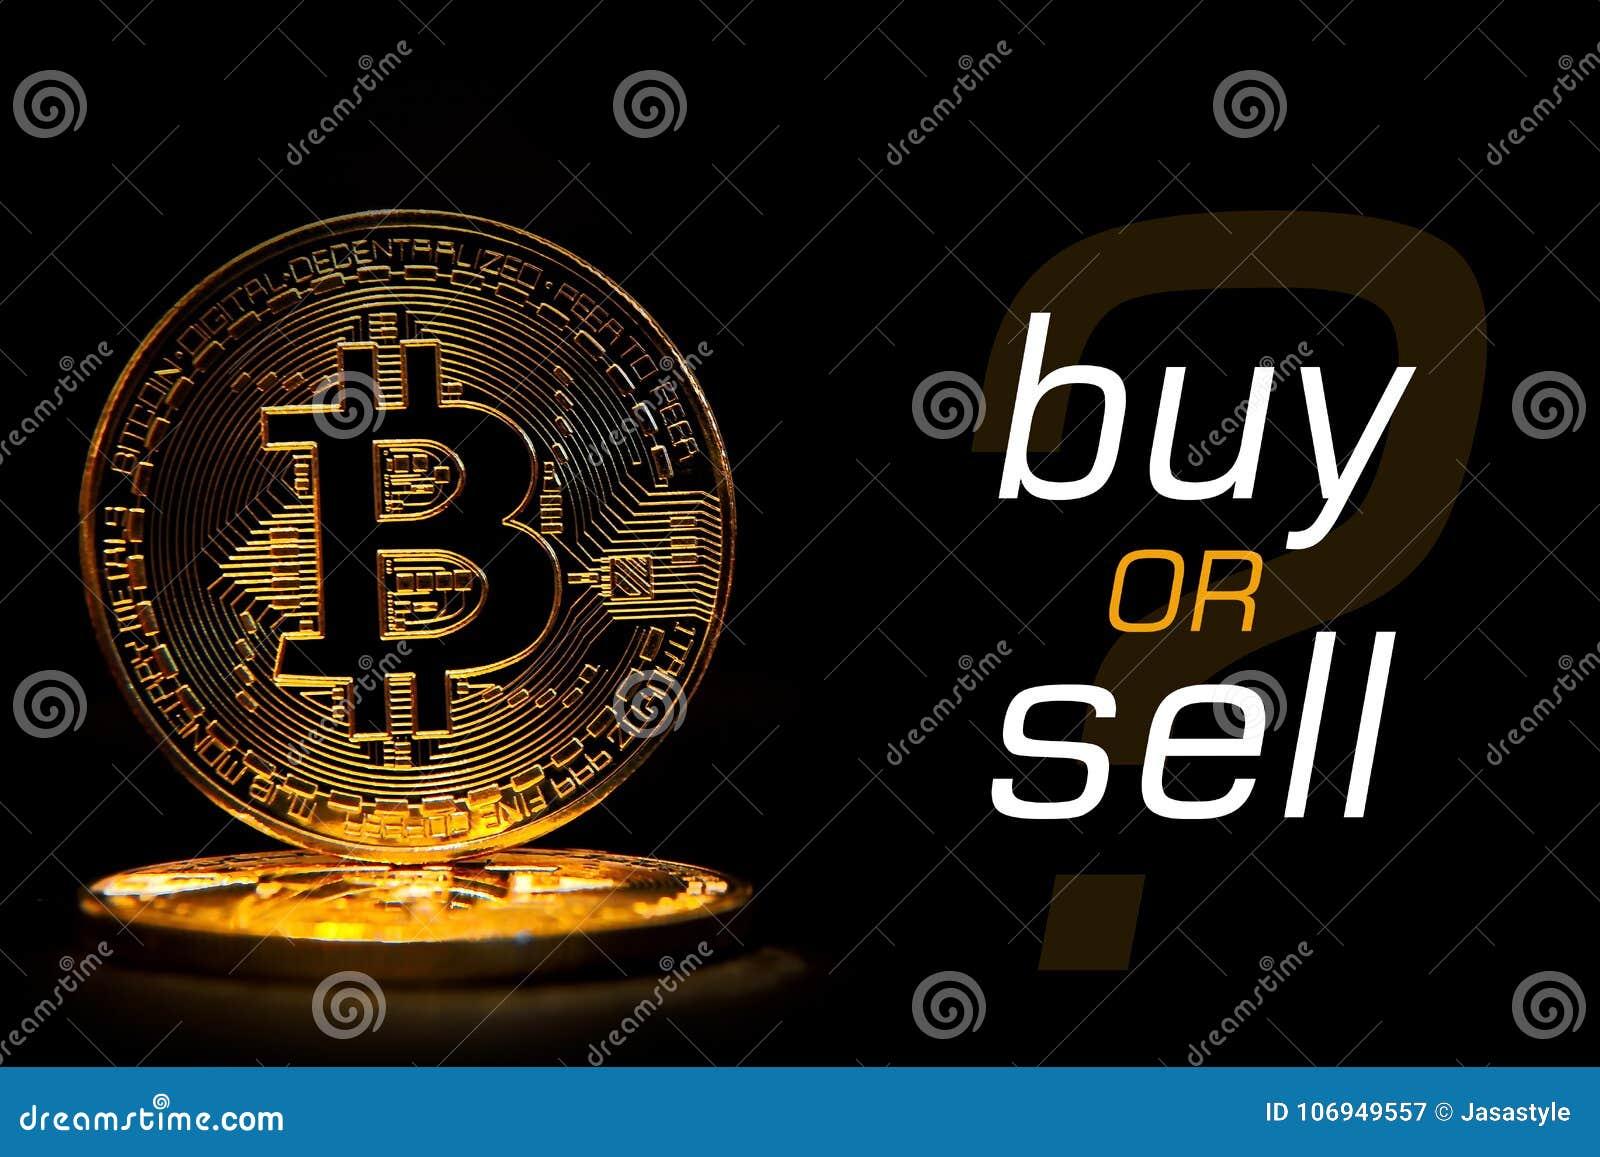 Buy sell bitcoins falkirk fc vs livingston betting experts